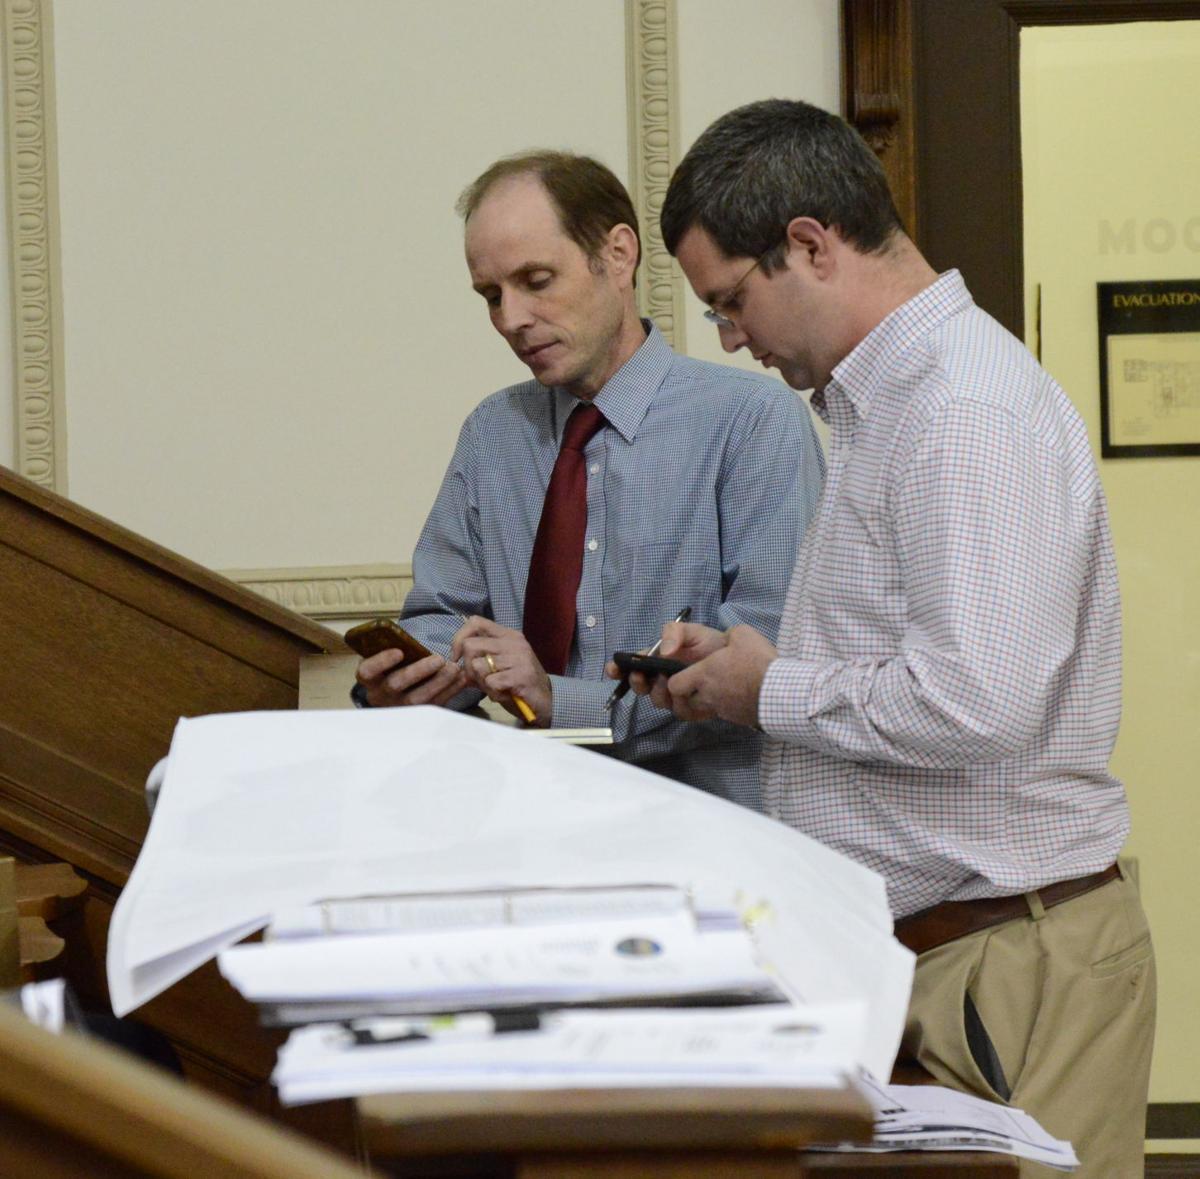 plott creek apartment site plan hearing william ratchford tom jones.JPG